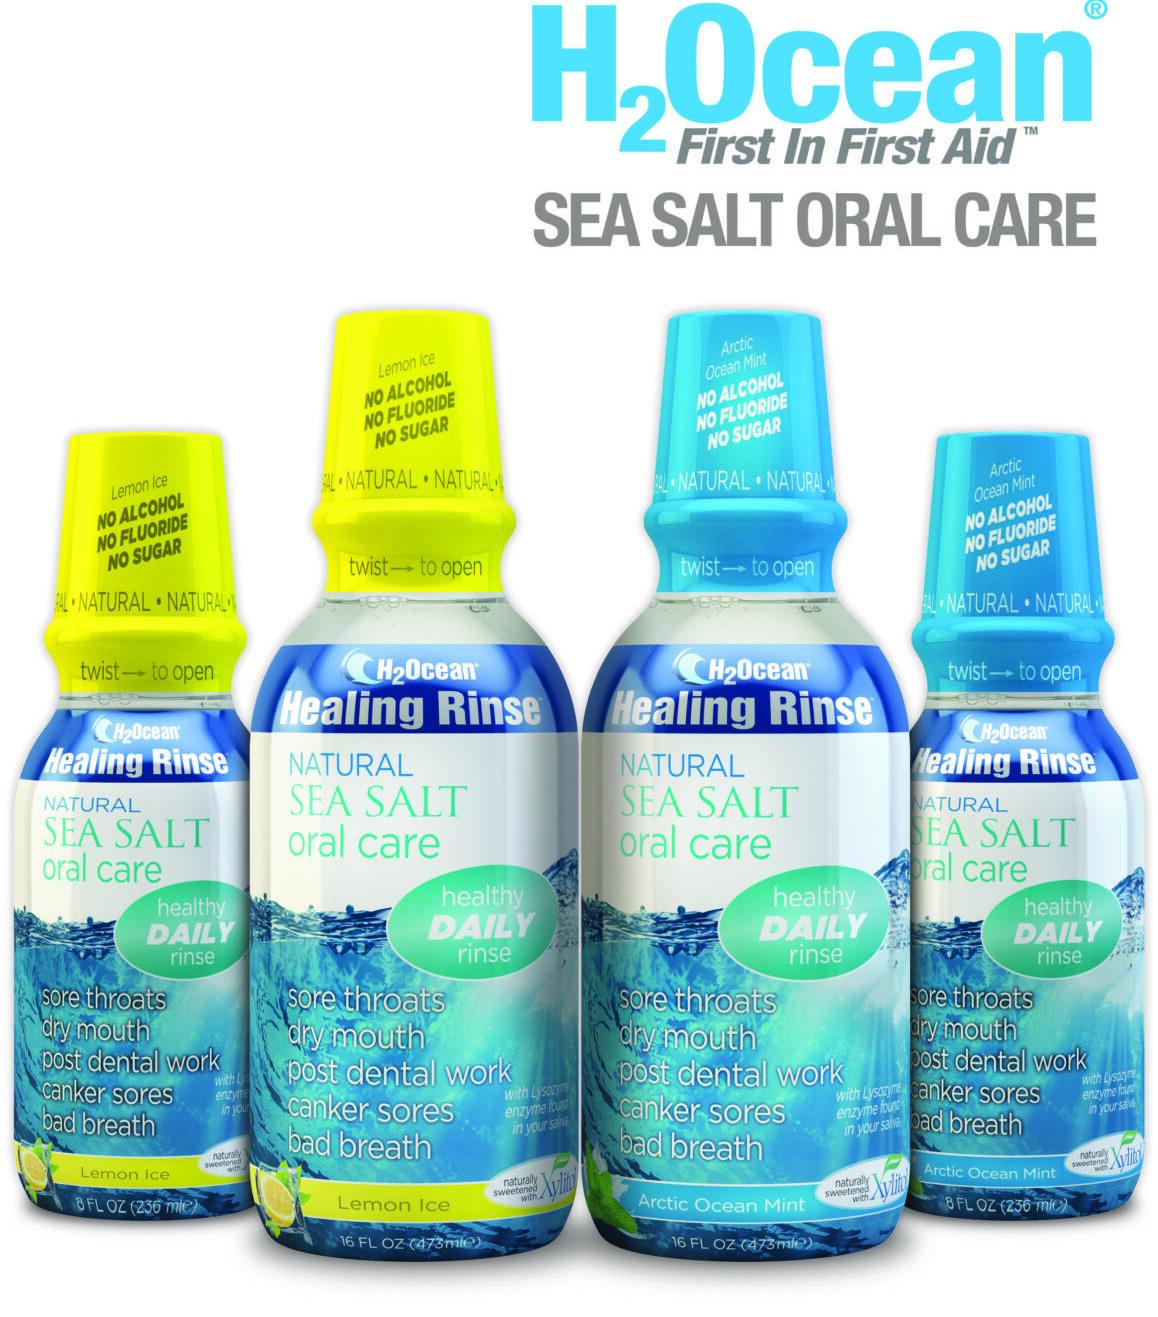 H2Ocean Sea Salt Oral Care